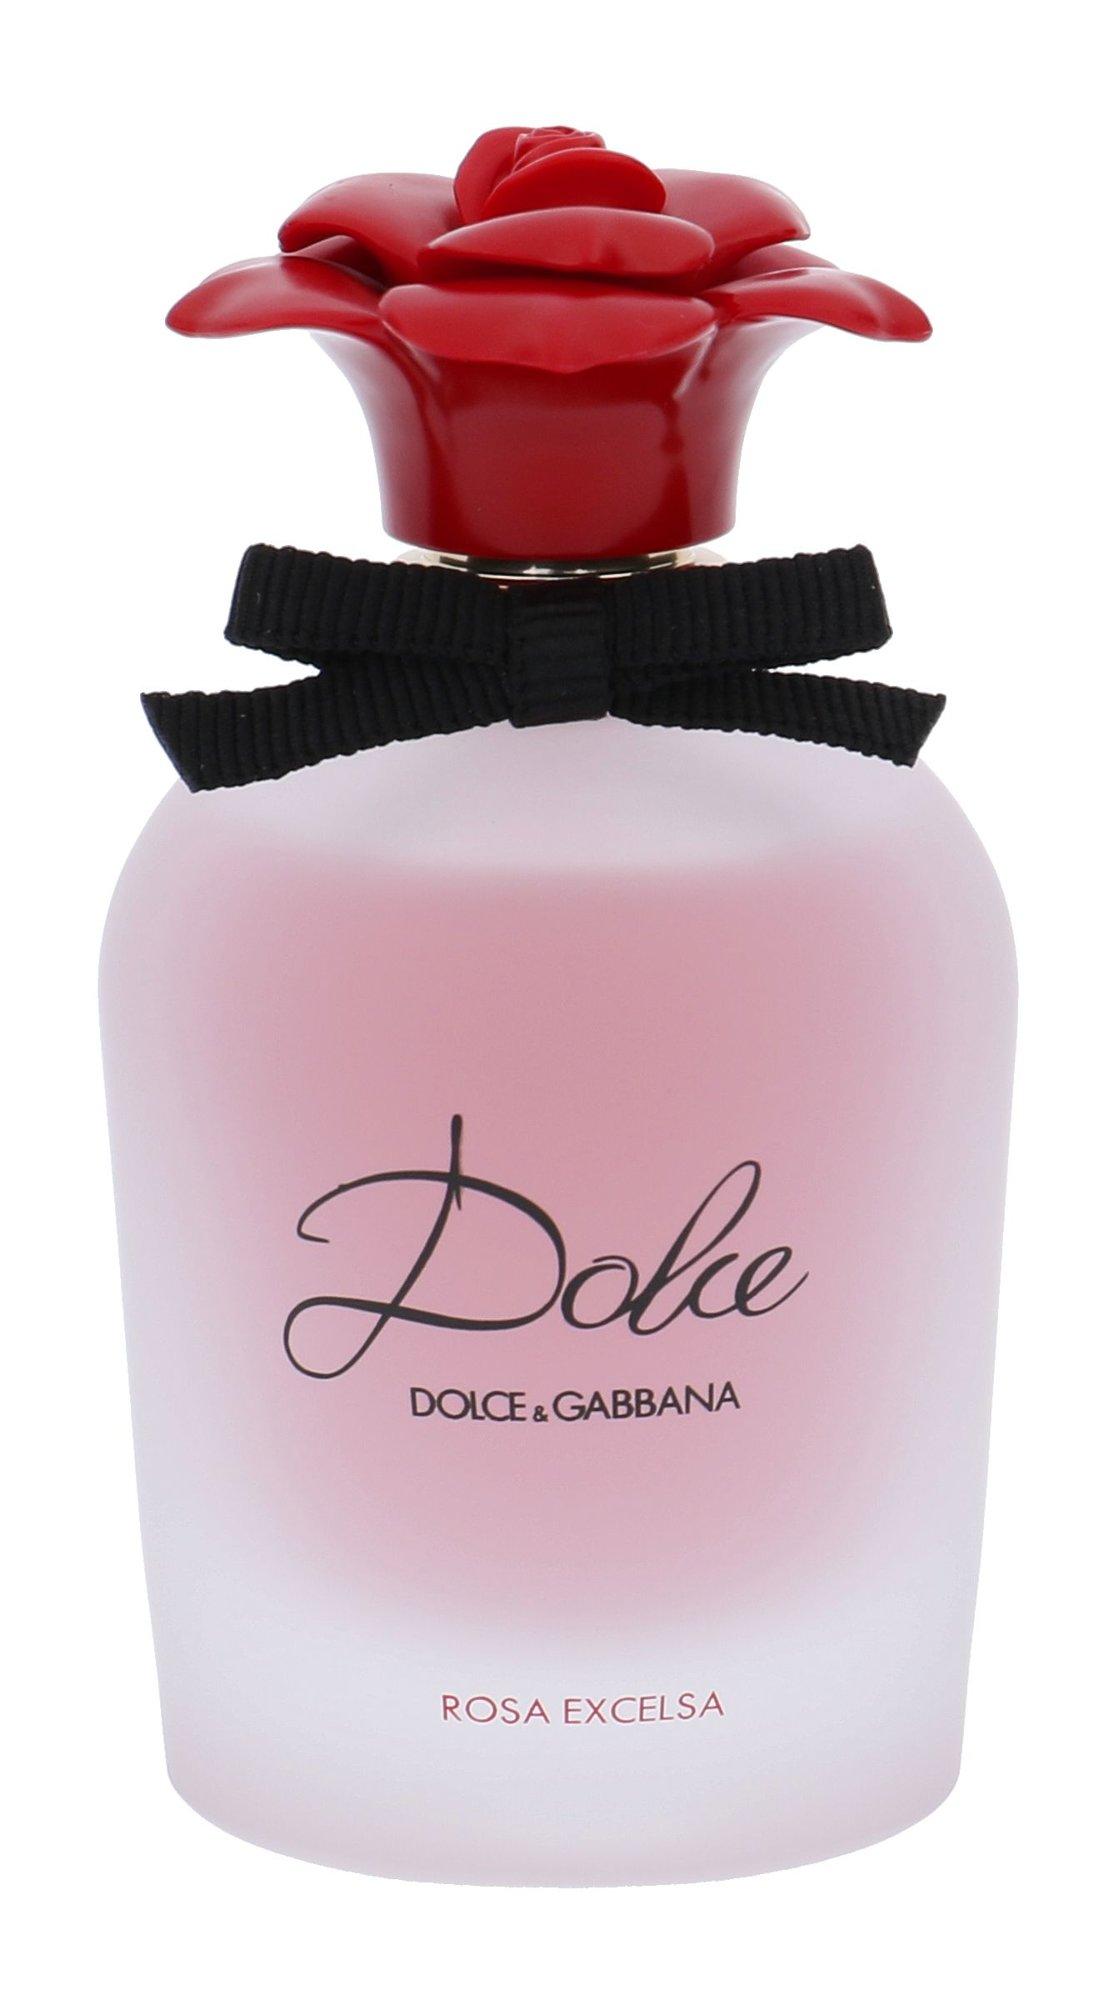 Dolce&Gabbana Dolce EDP 75ml  Rosa Excelsa